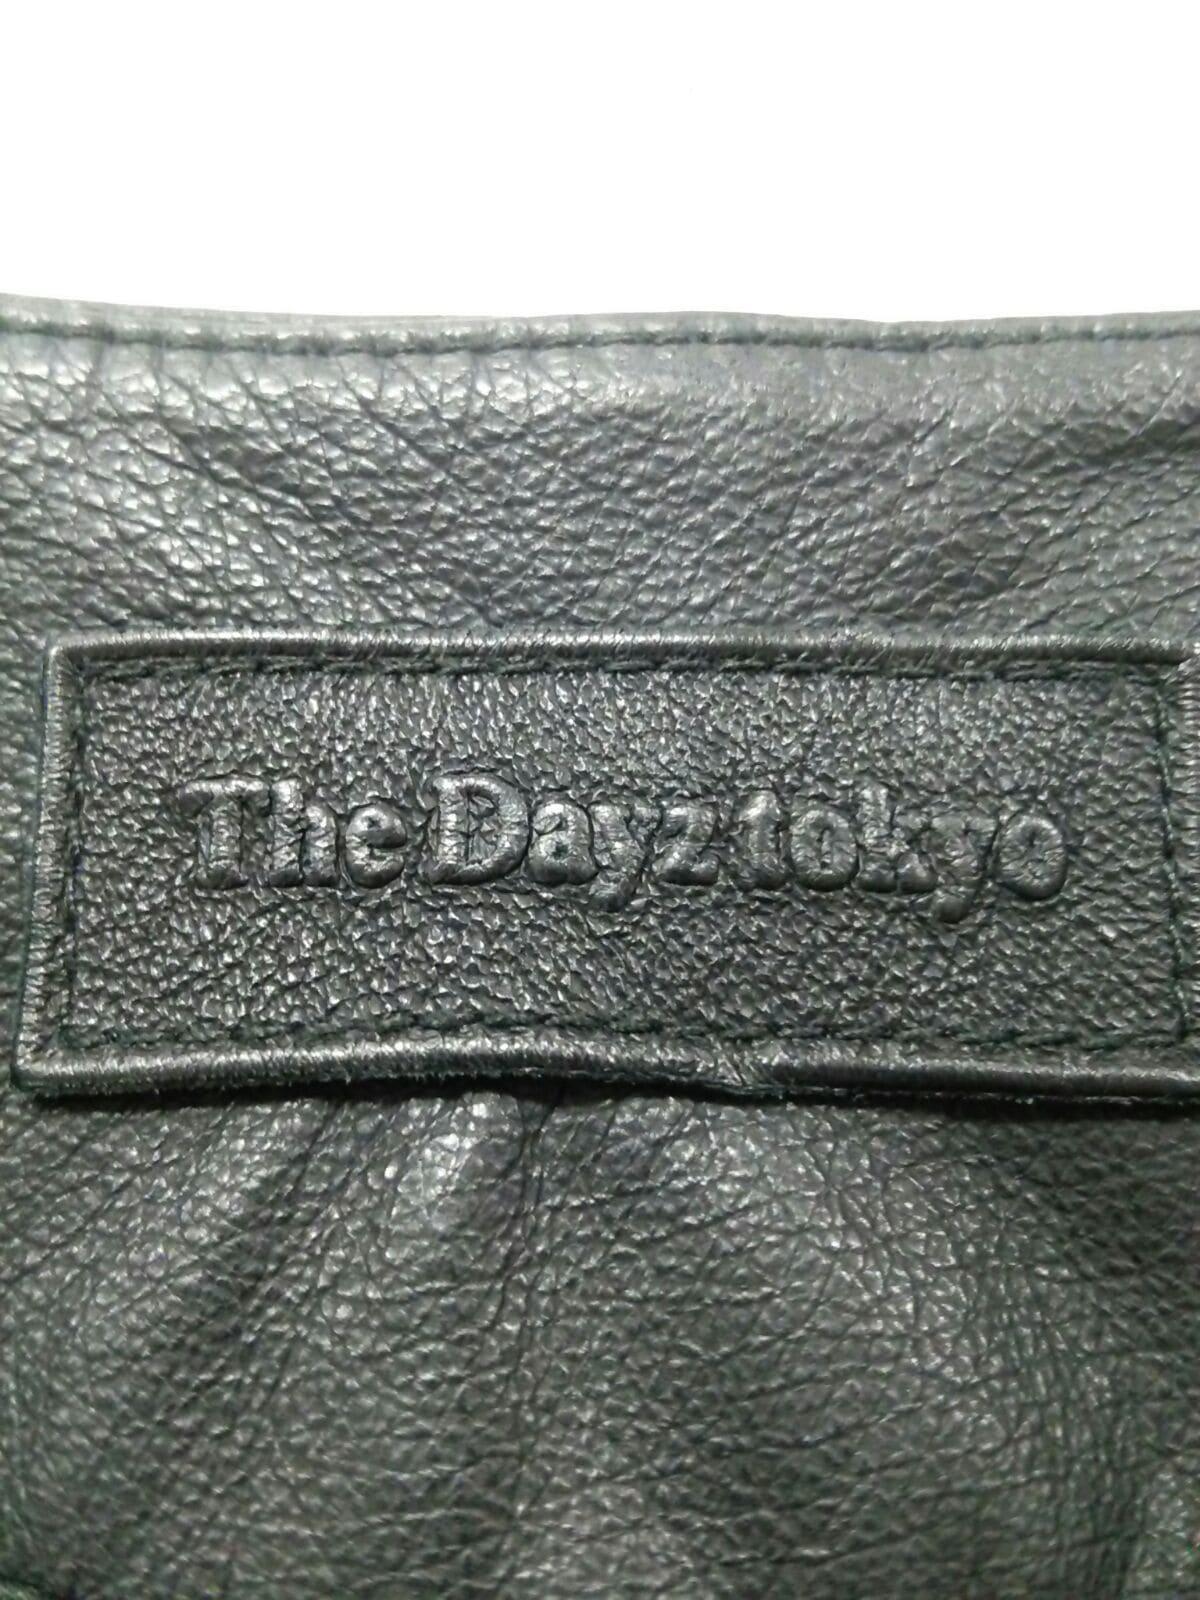 TheDayztokyo(ザデイズトウキョウ)のジャケット